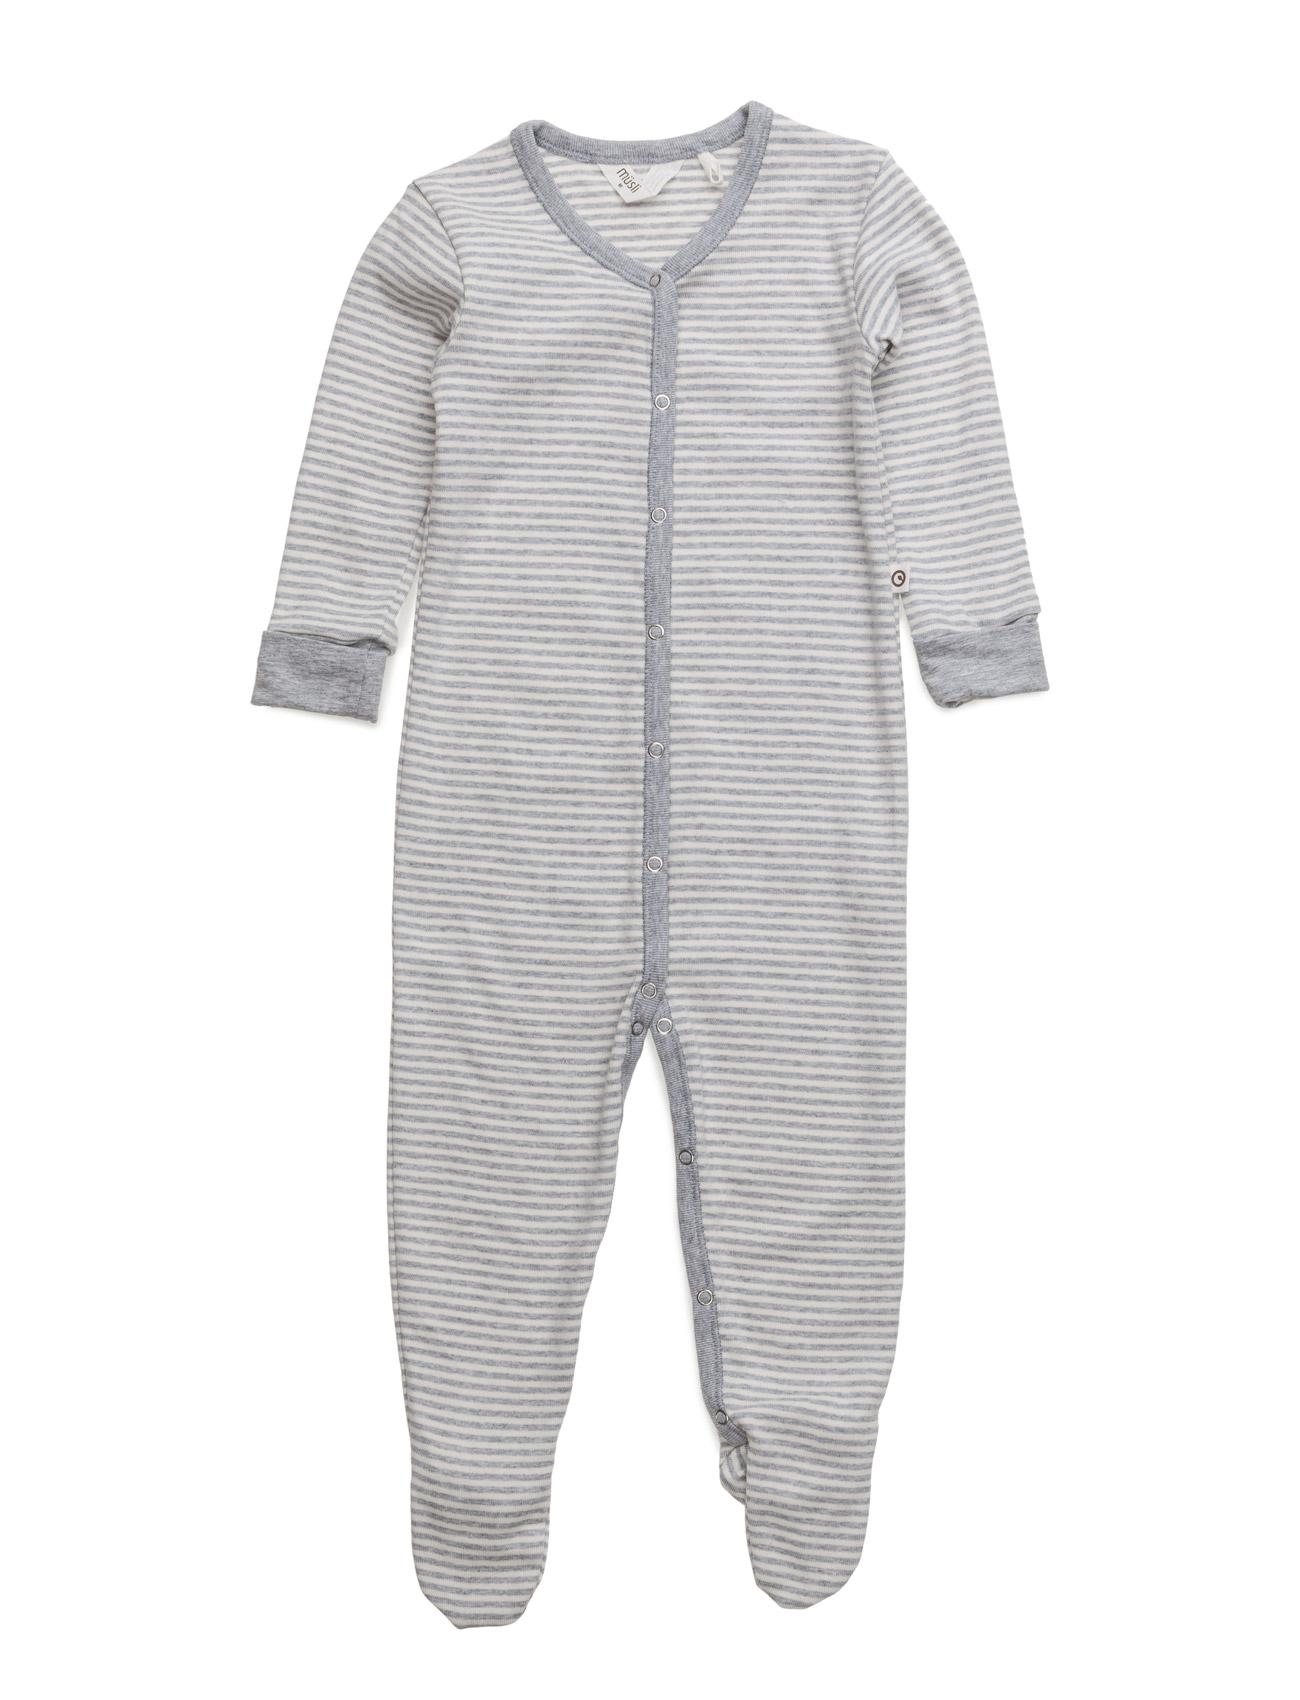 Stripe Bodysuit W/Feet Müsli by Green Cotton Langærmede bodies til Børn i